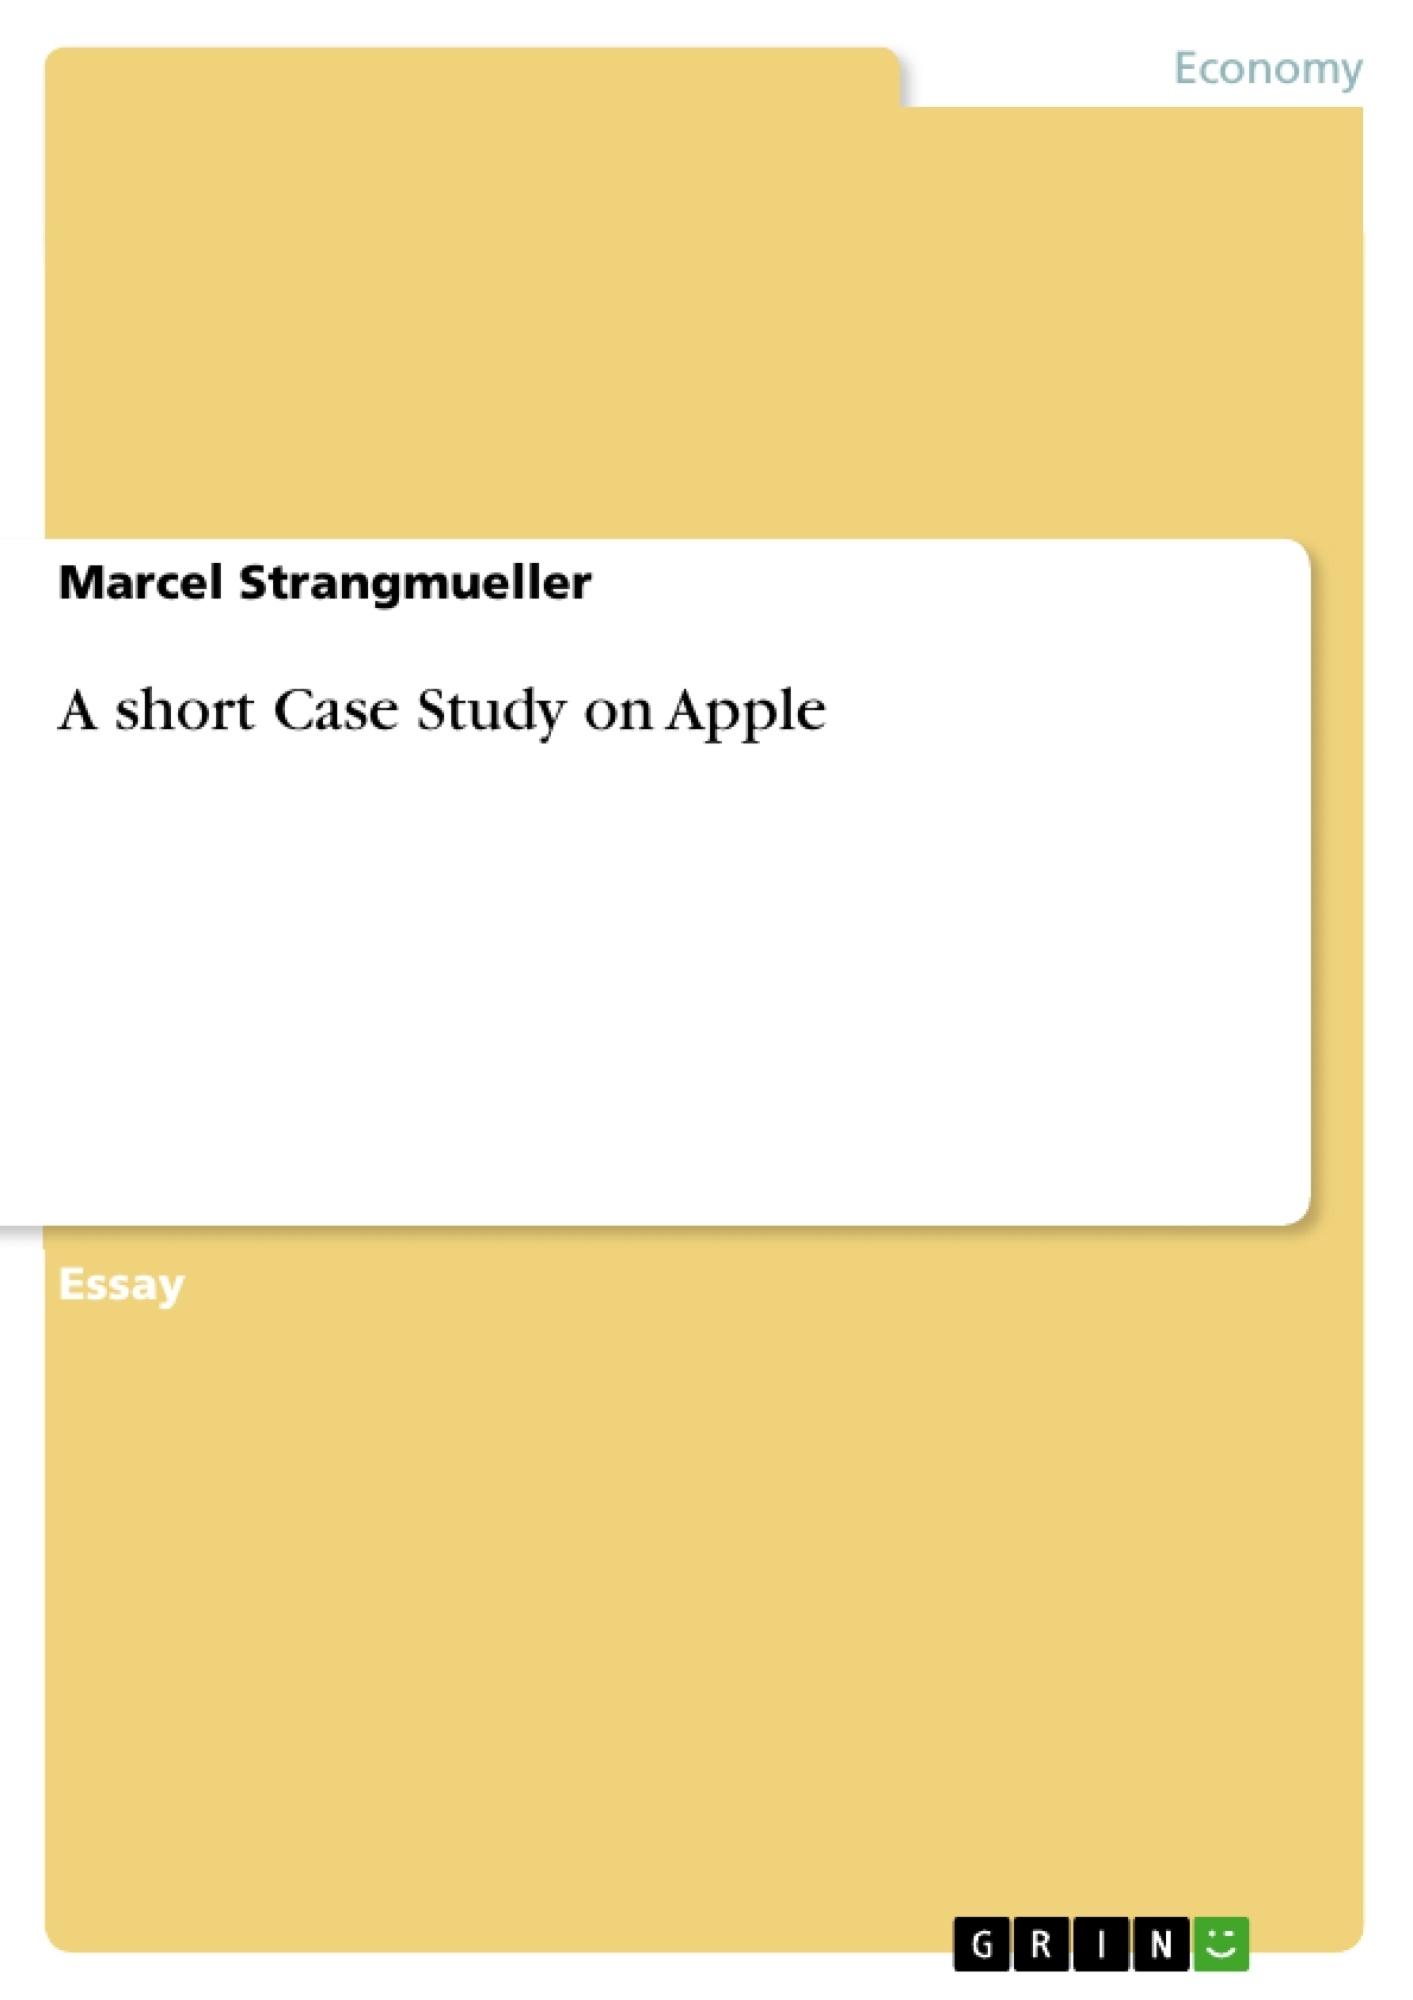 Title: A short Case Study on Apple